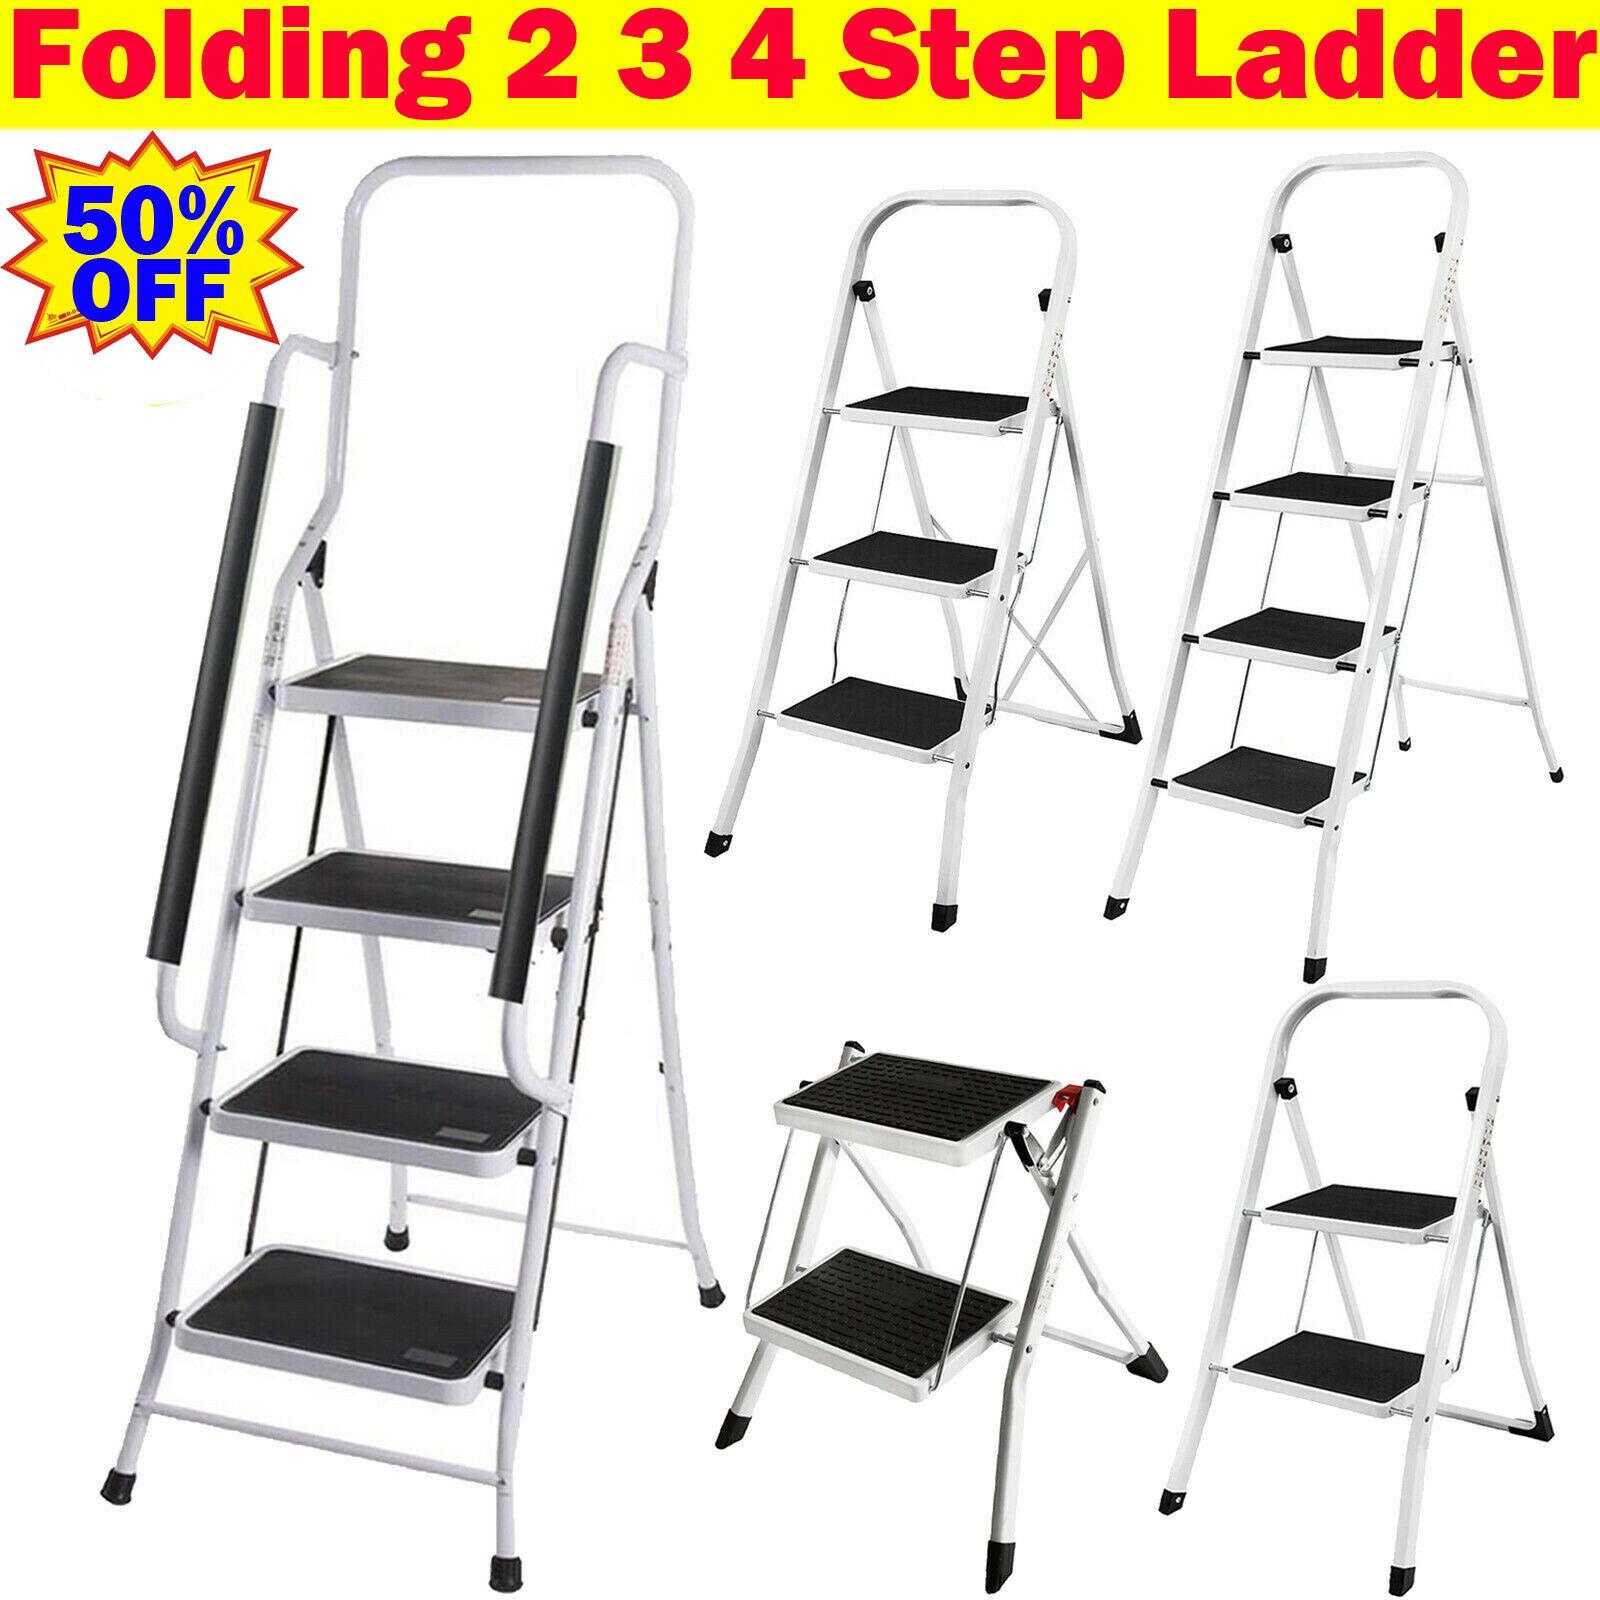 Foldable 4 Step Ladder Folding Step ladder Non Slip Tread Safety Steel Step NEW